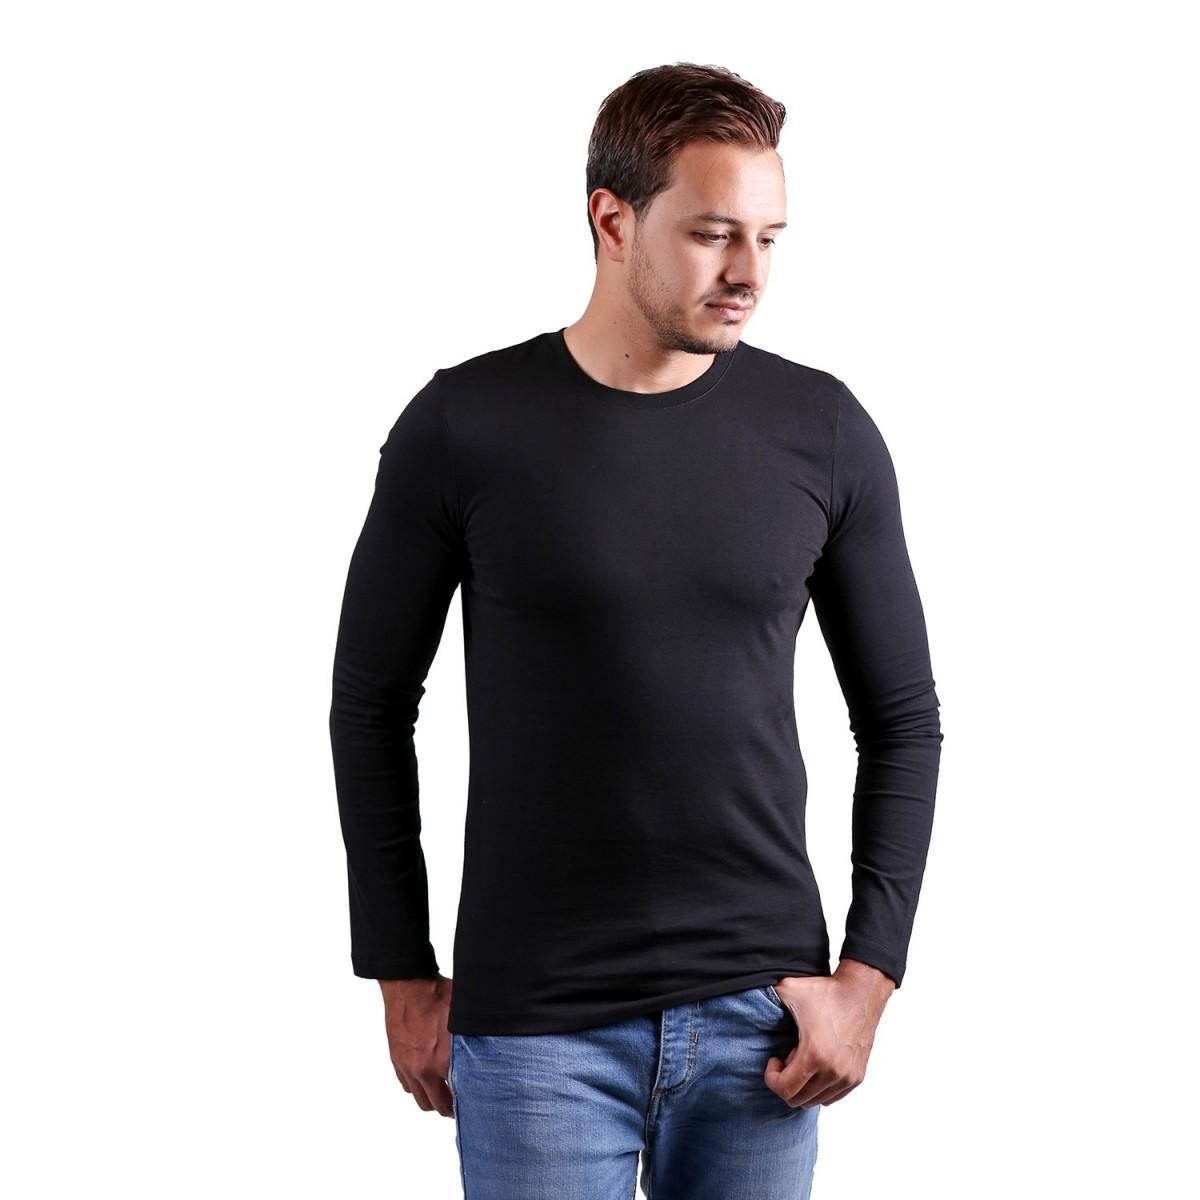 T_ Shirt Basic Homme Hamadi Abid - Prix : 25,990 TND